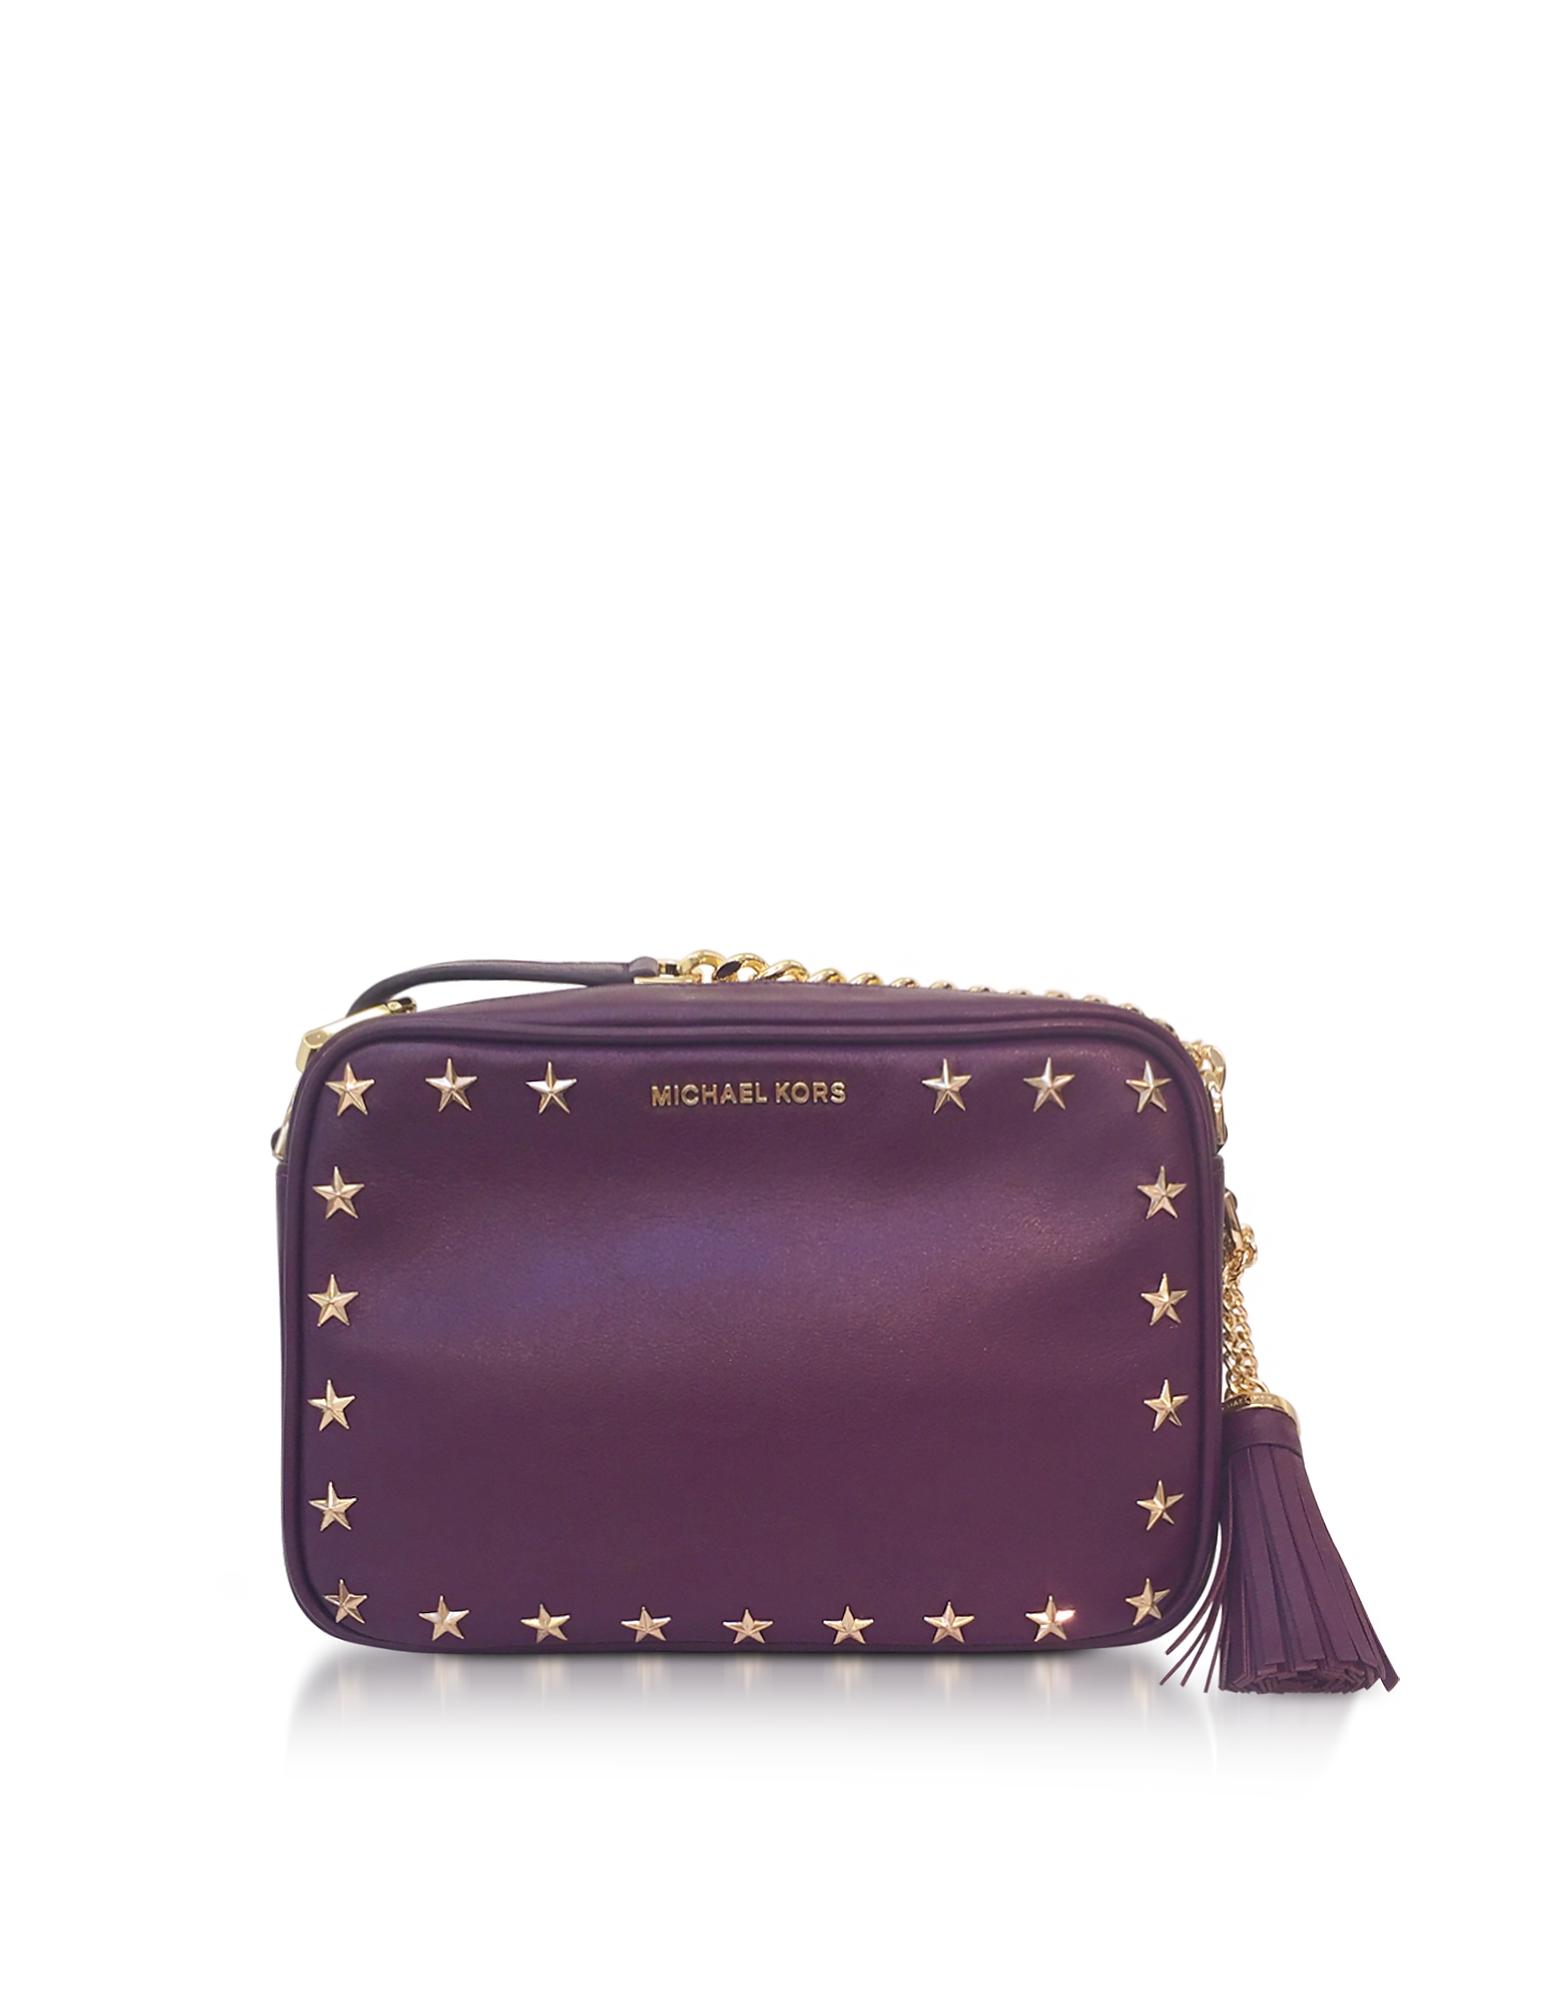 Michael Kors Handbags, Ginny Medium Damson Leather Camera Bag w/Stars